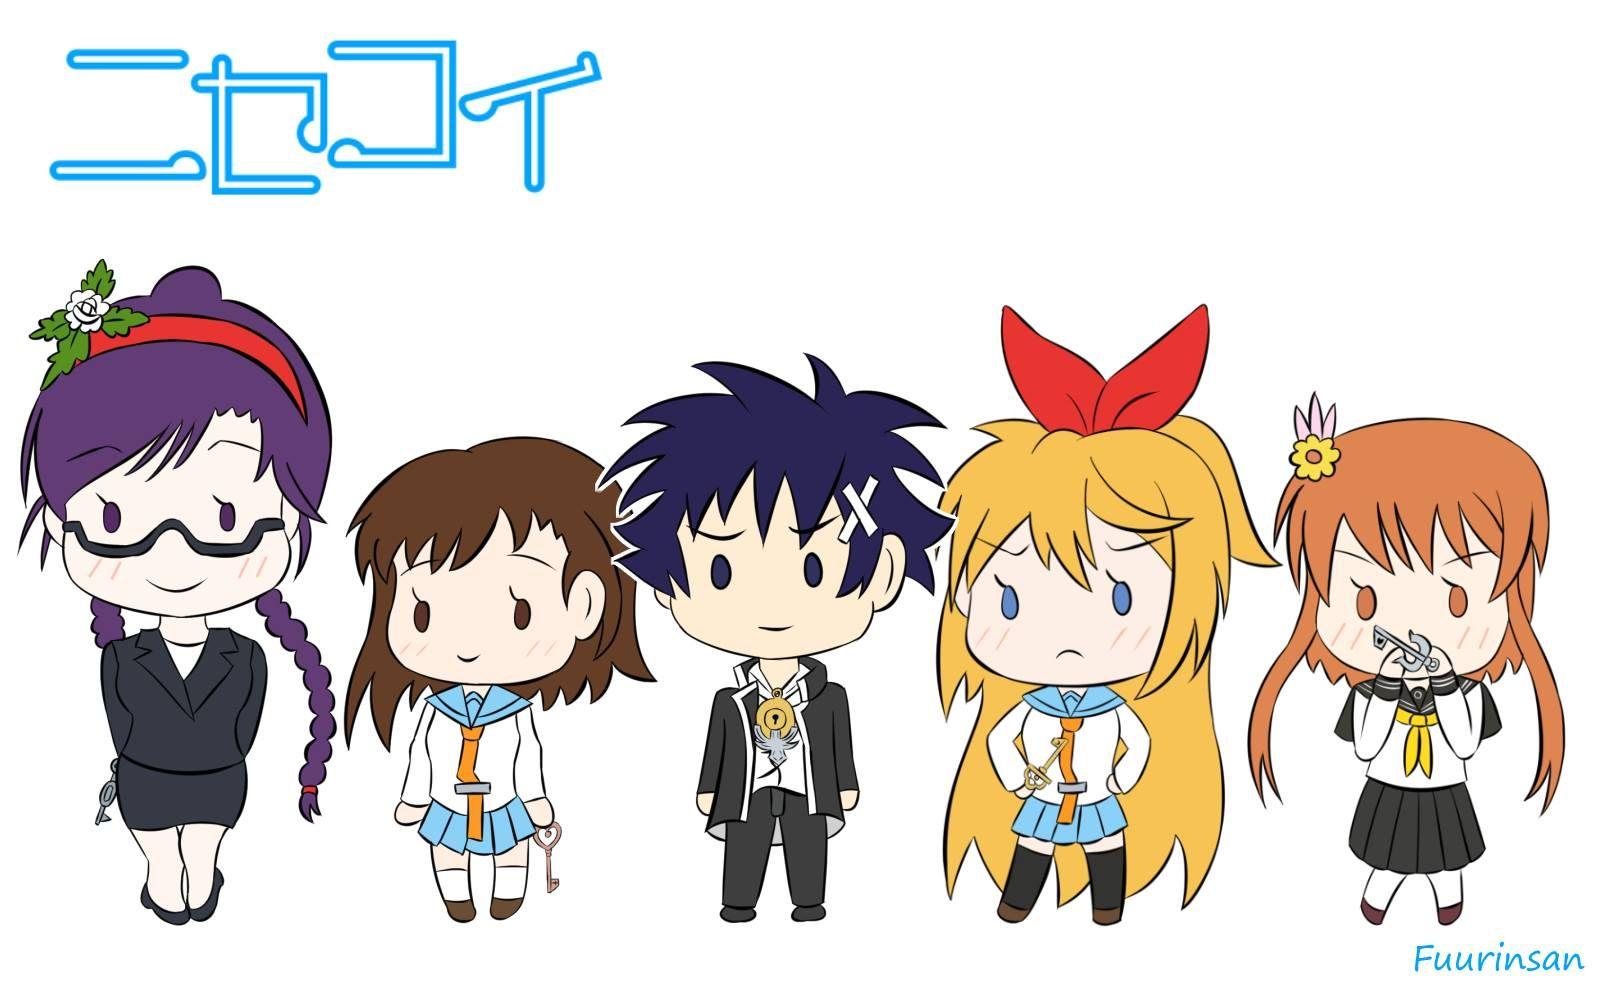 280. Nisekoi (Fake / False Love) Chibi Character Anime